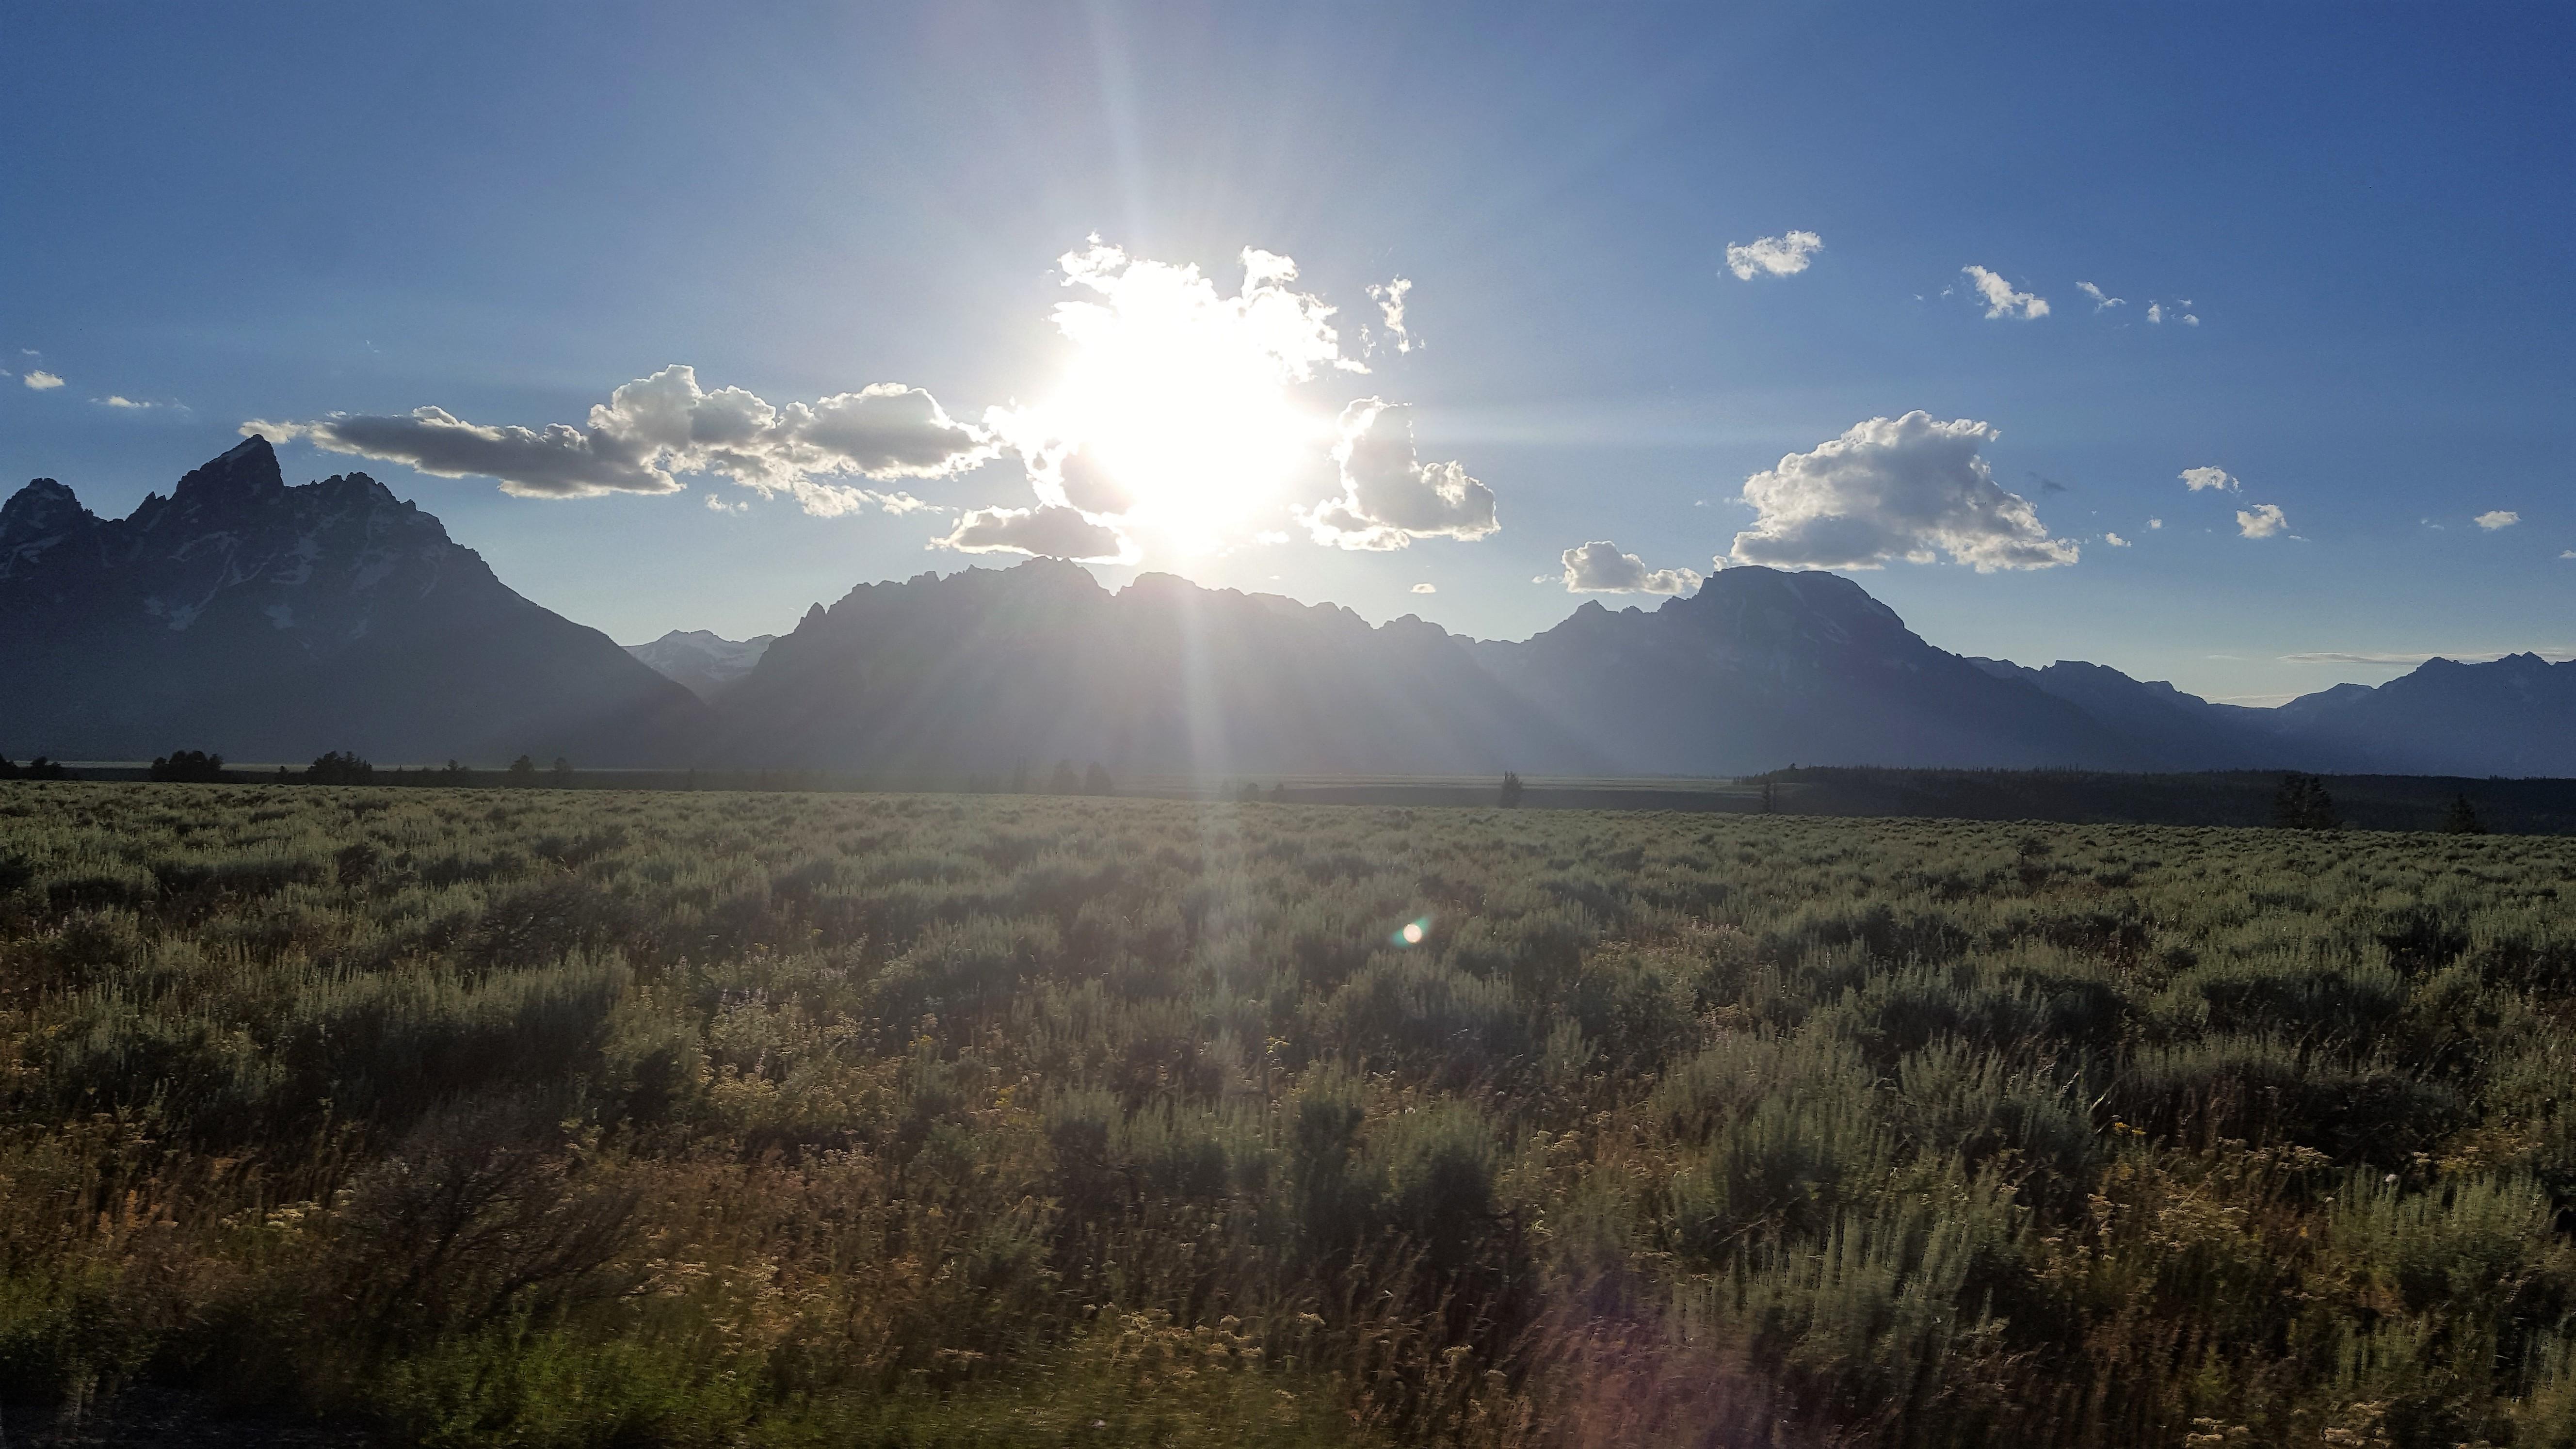 Chasing The Westward Sun The Ardent Axiom